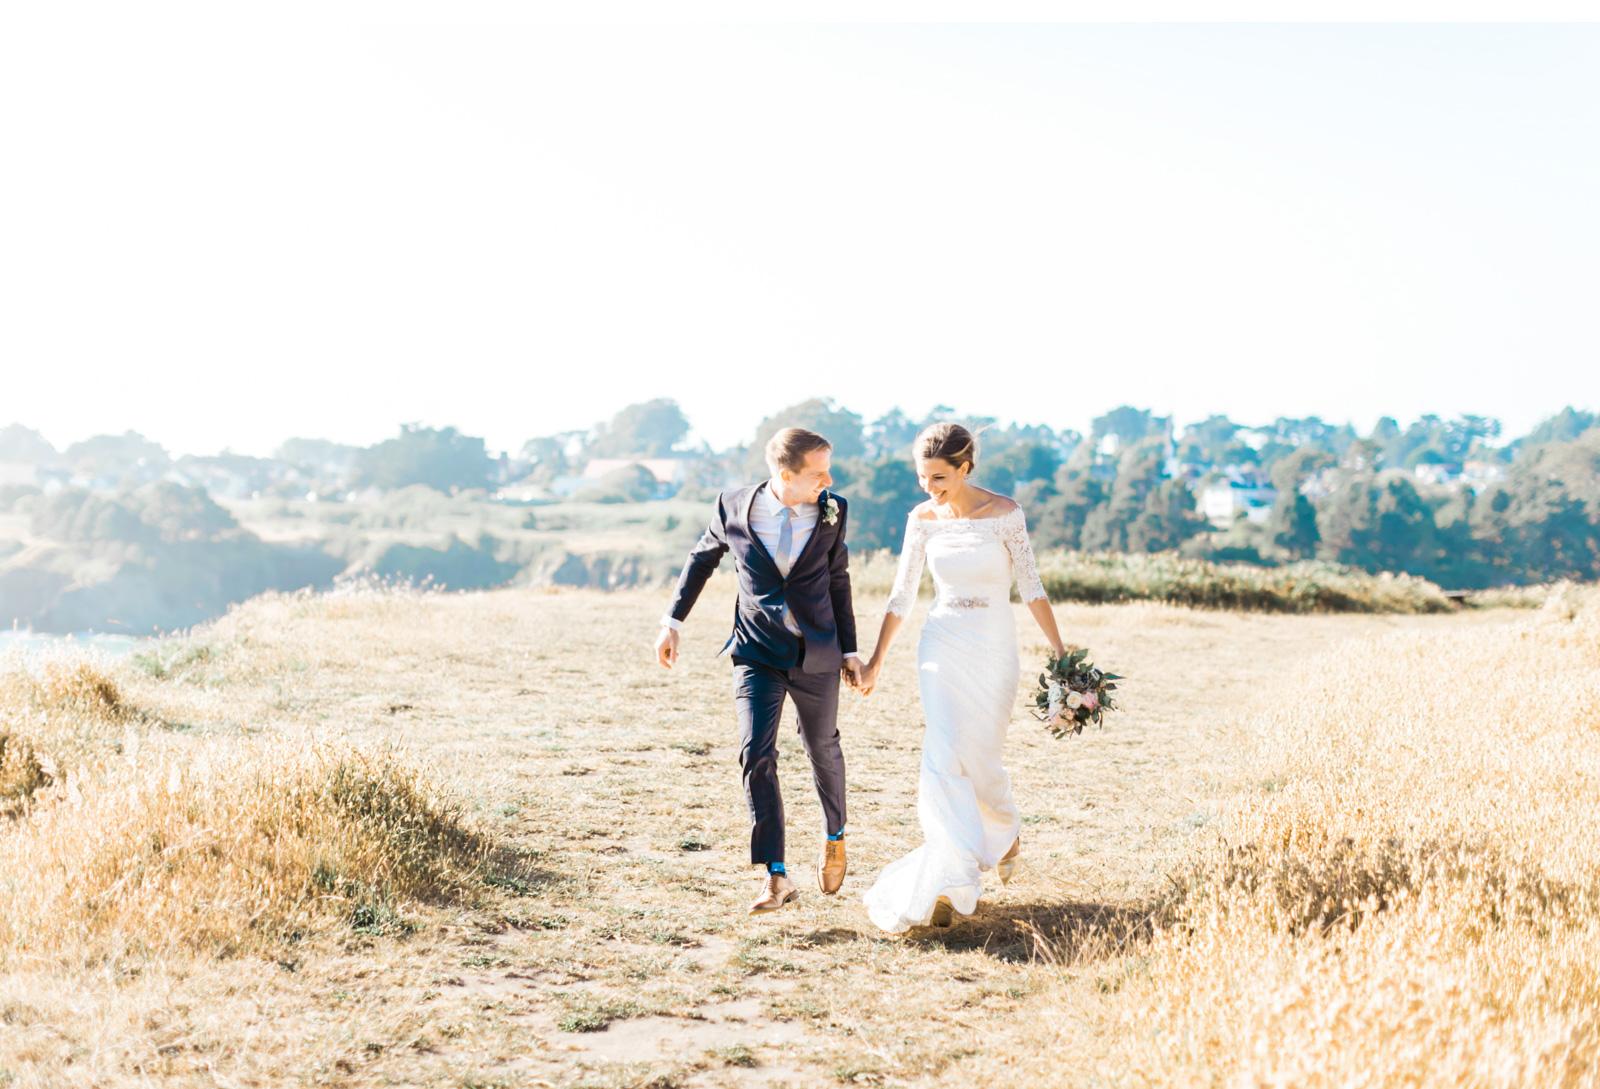 Style-Me-Pretty-Mendocino-Wedding-Natalie-Schutt-Photography_12.jpg